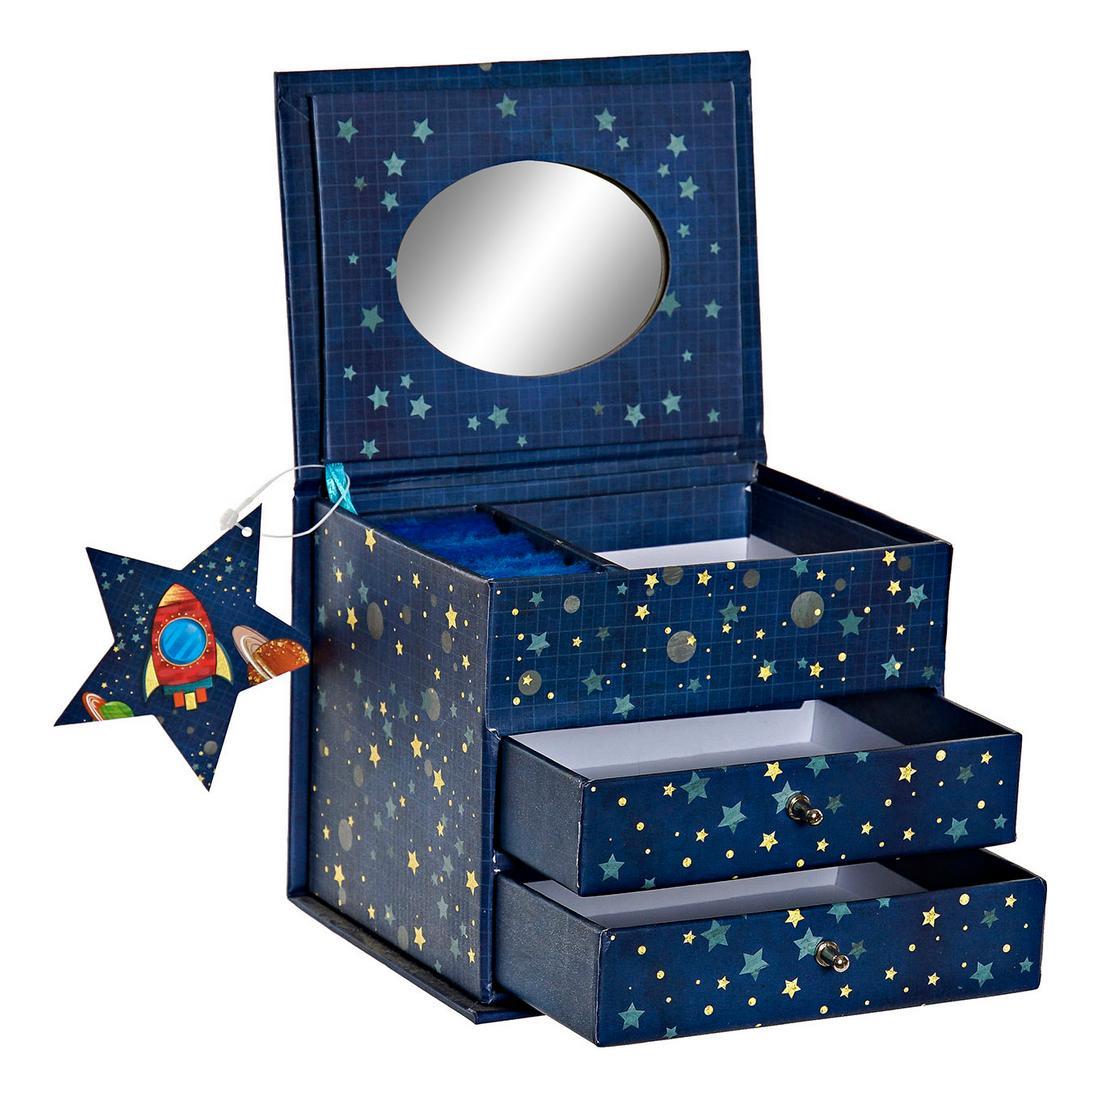 Jewelry box DKD Home Decor Cosmos (13 x 10 x 10.2 cm)